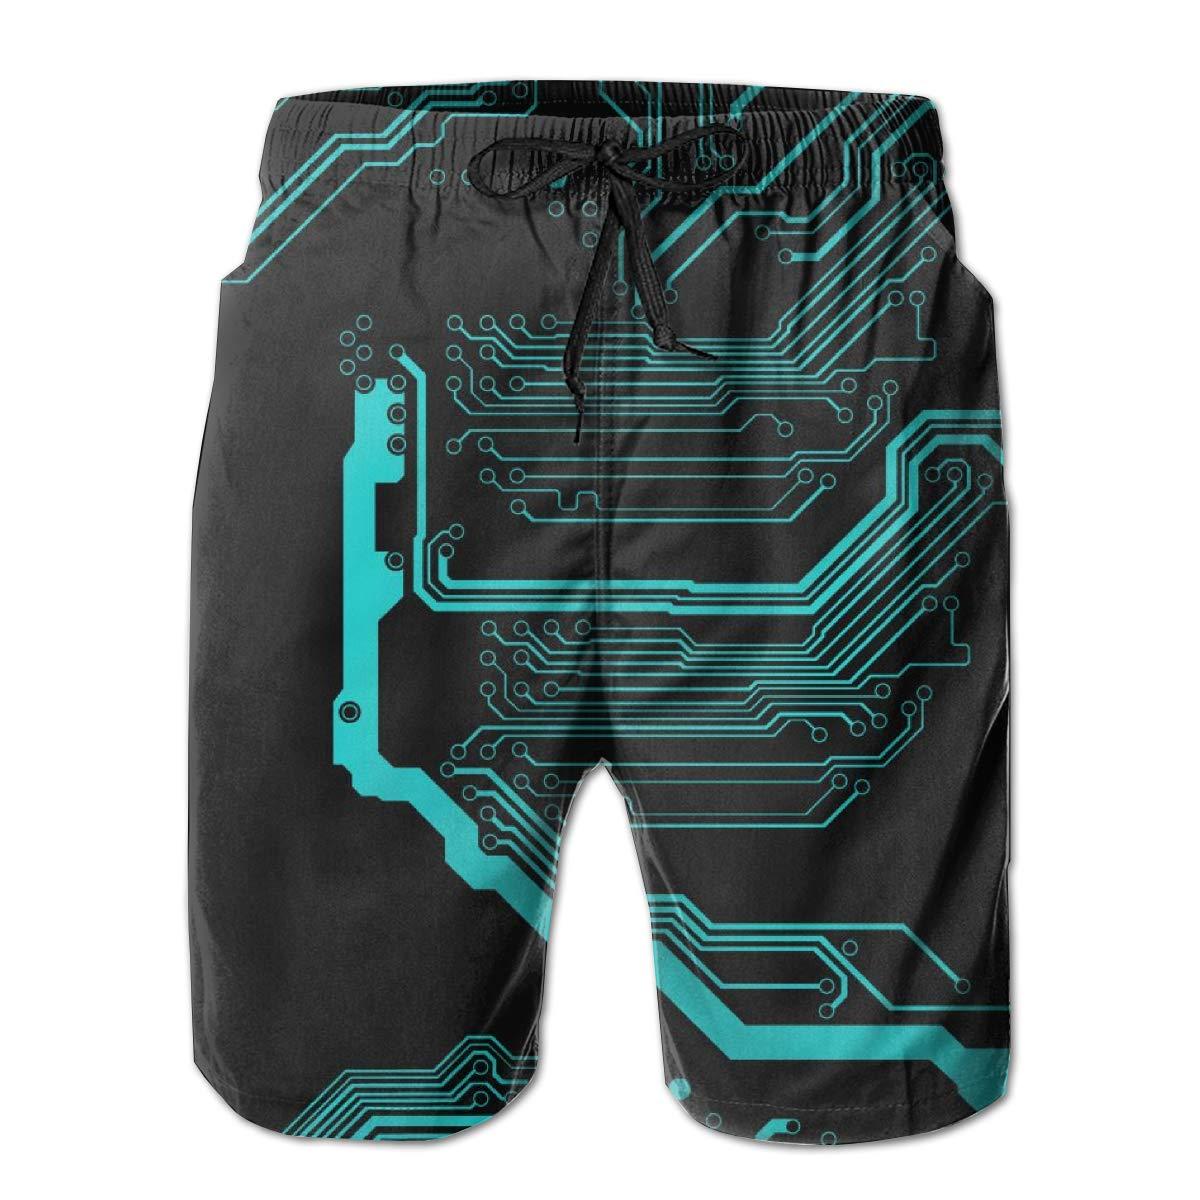 HZamora/_H Men Circuit Board Summer Breathable Quick-Drying Swim Trunks Beach Shorts Cargo Shorts